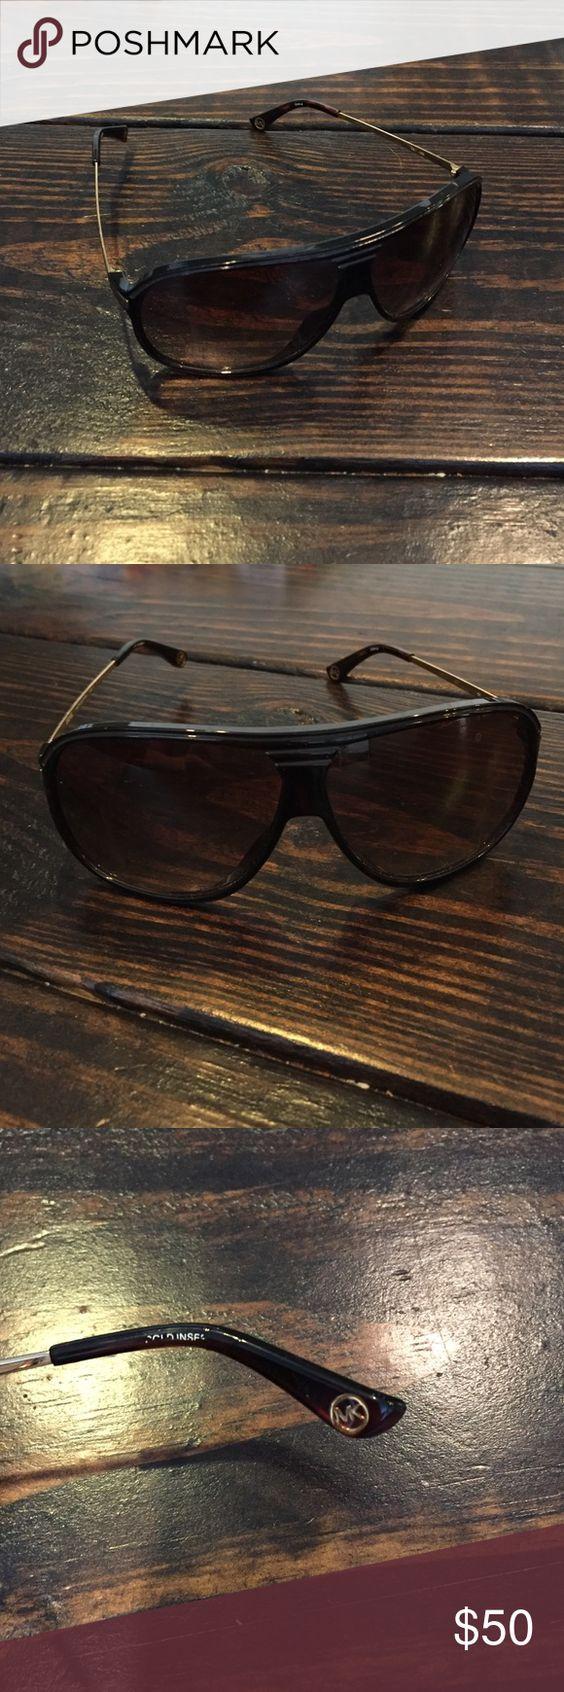 Michael Kors medina sunglasses Great condition Michael Kors Accessories Sunglasses